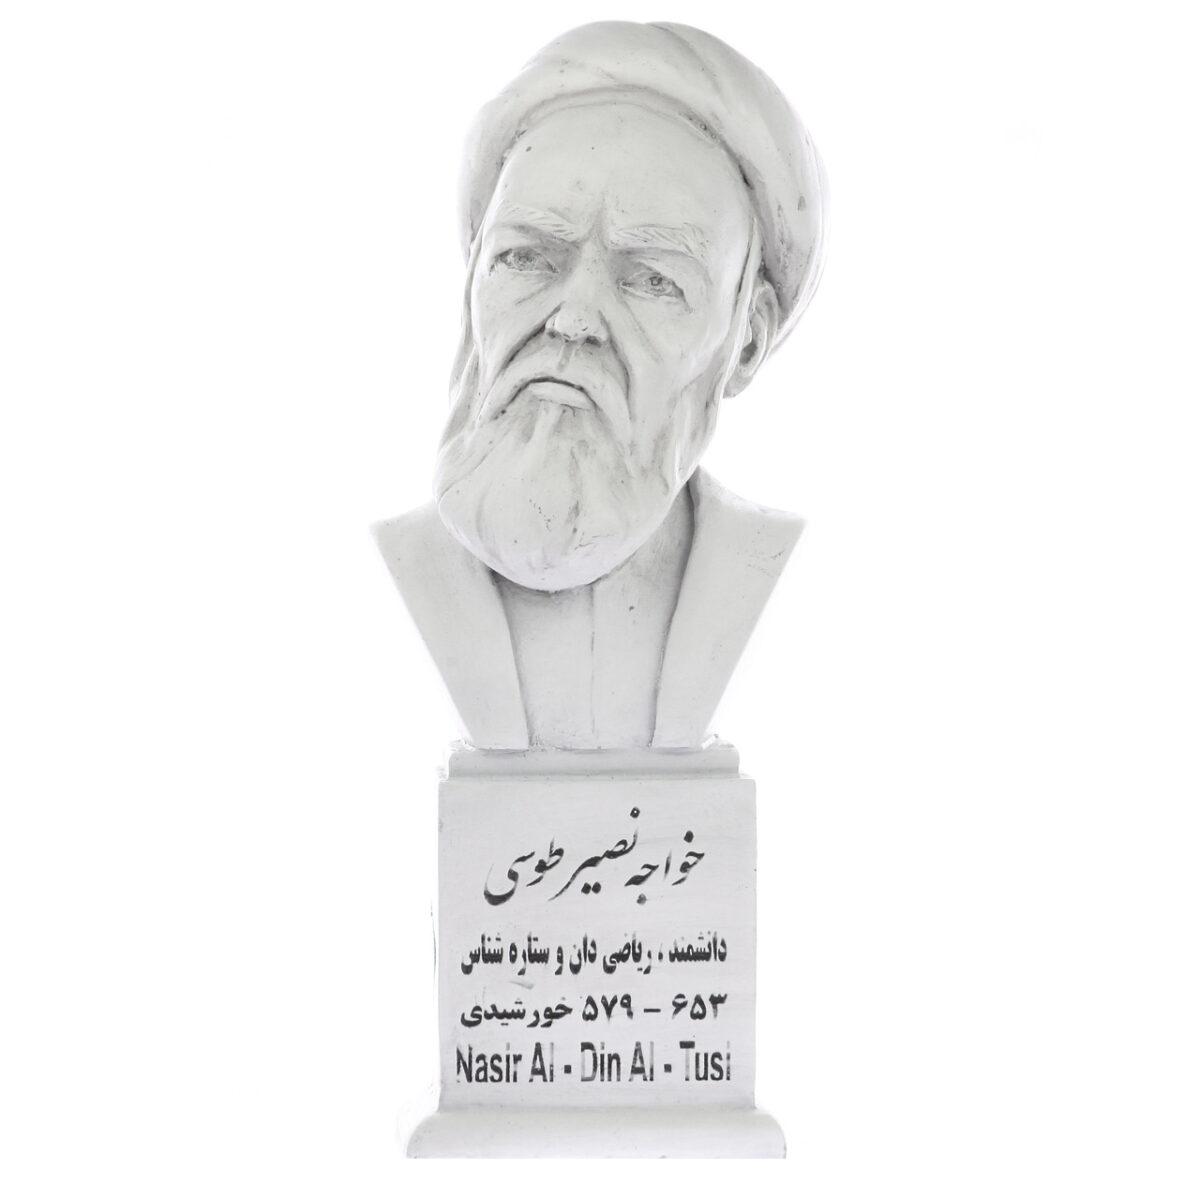 khaje toosi s 1200x1200 - سردیس خواجه نصیرالدین طوسی